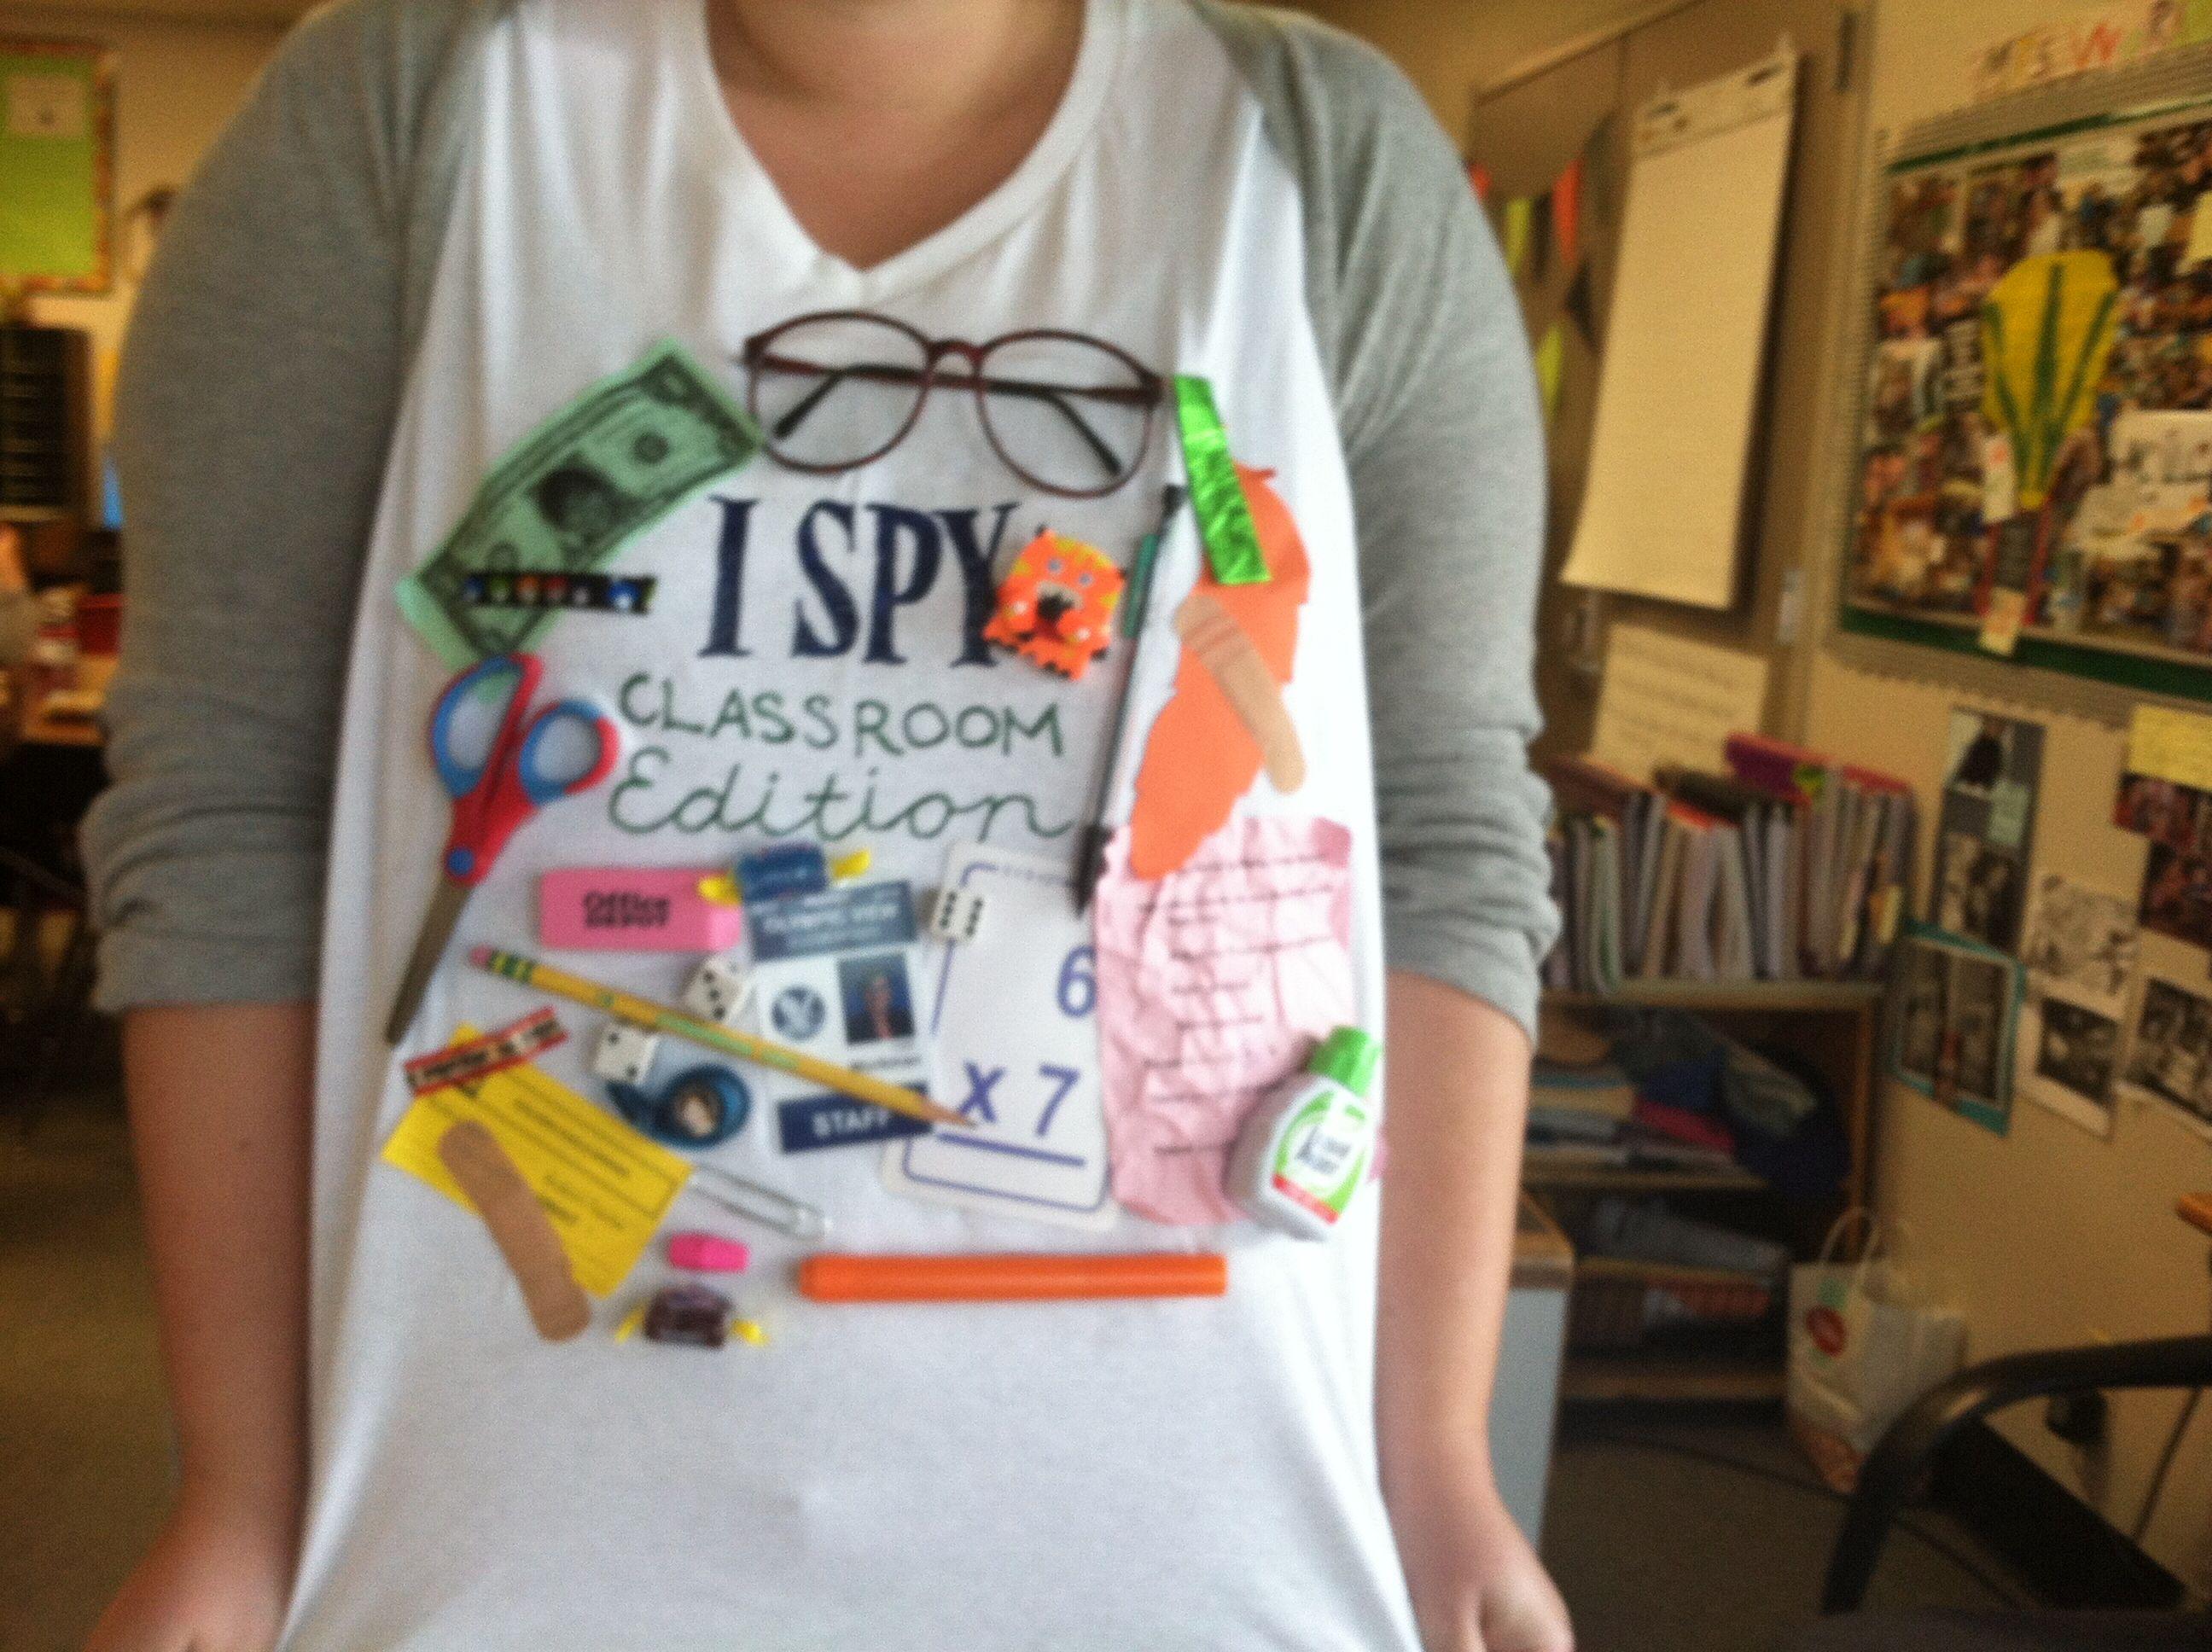 Classroom Dress Up Ideas : I spy classroom edition tshirt ideas pinterest